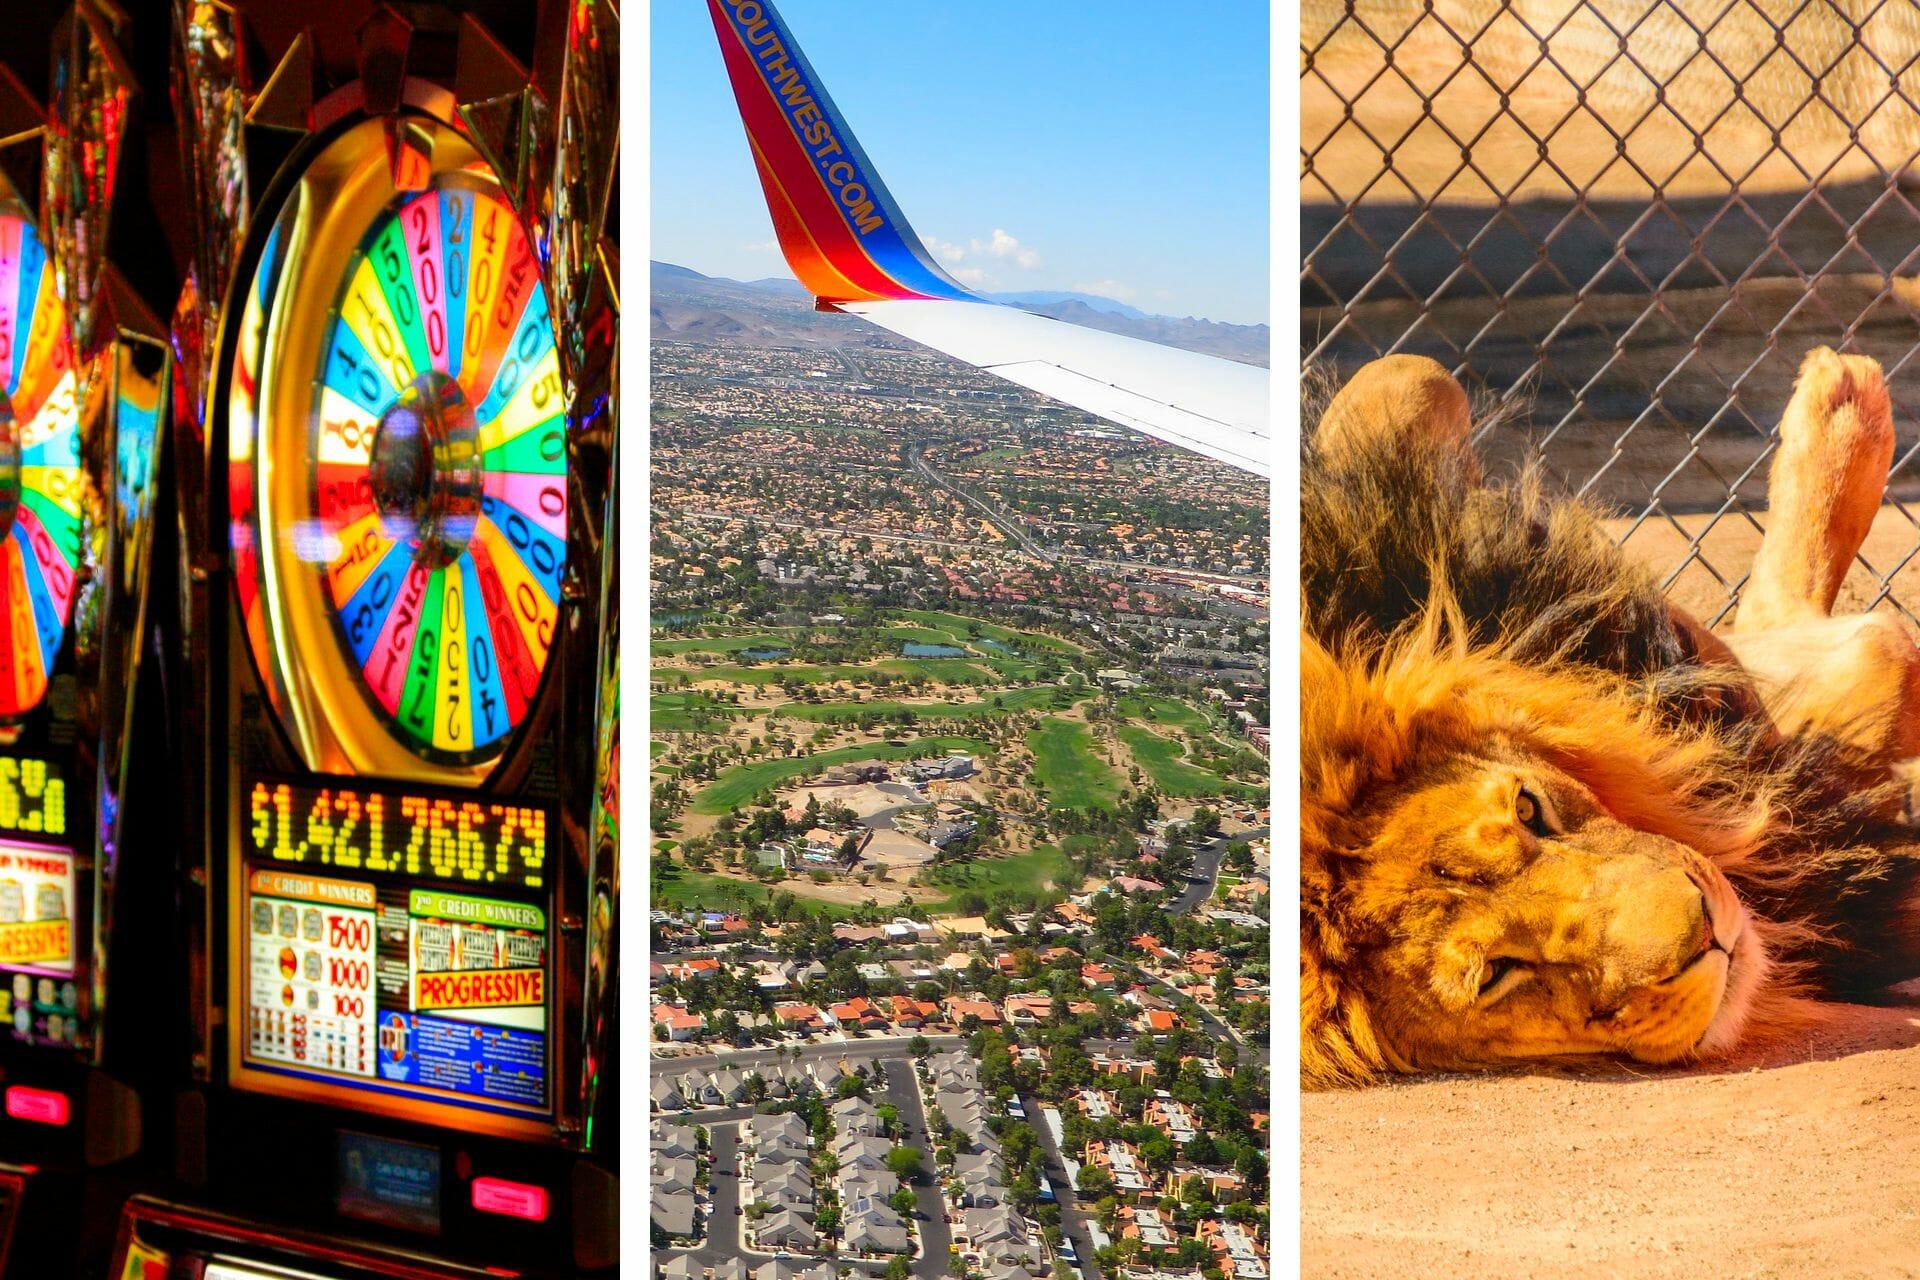 21+ All-American Things to Do in Henderson, Nevada (2021) via @allamericanatlas